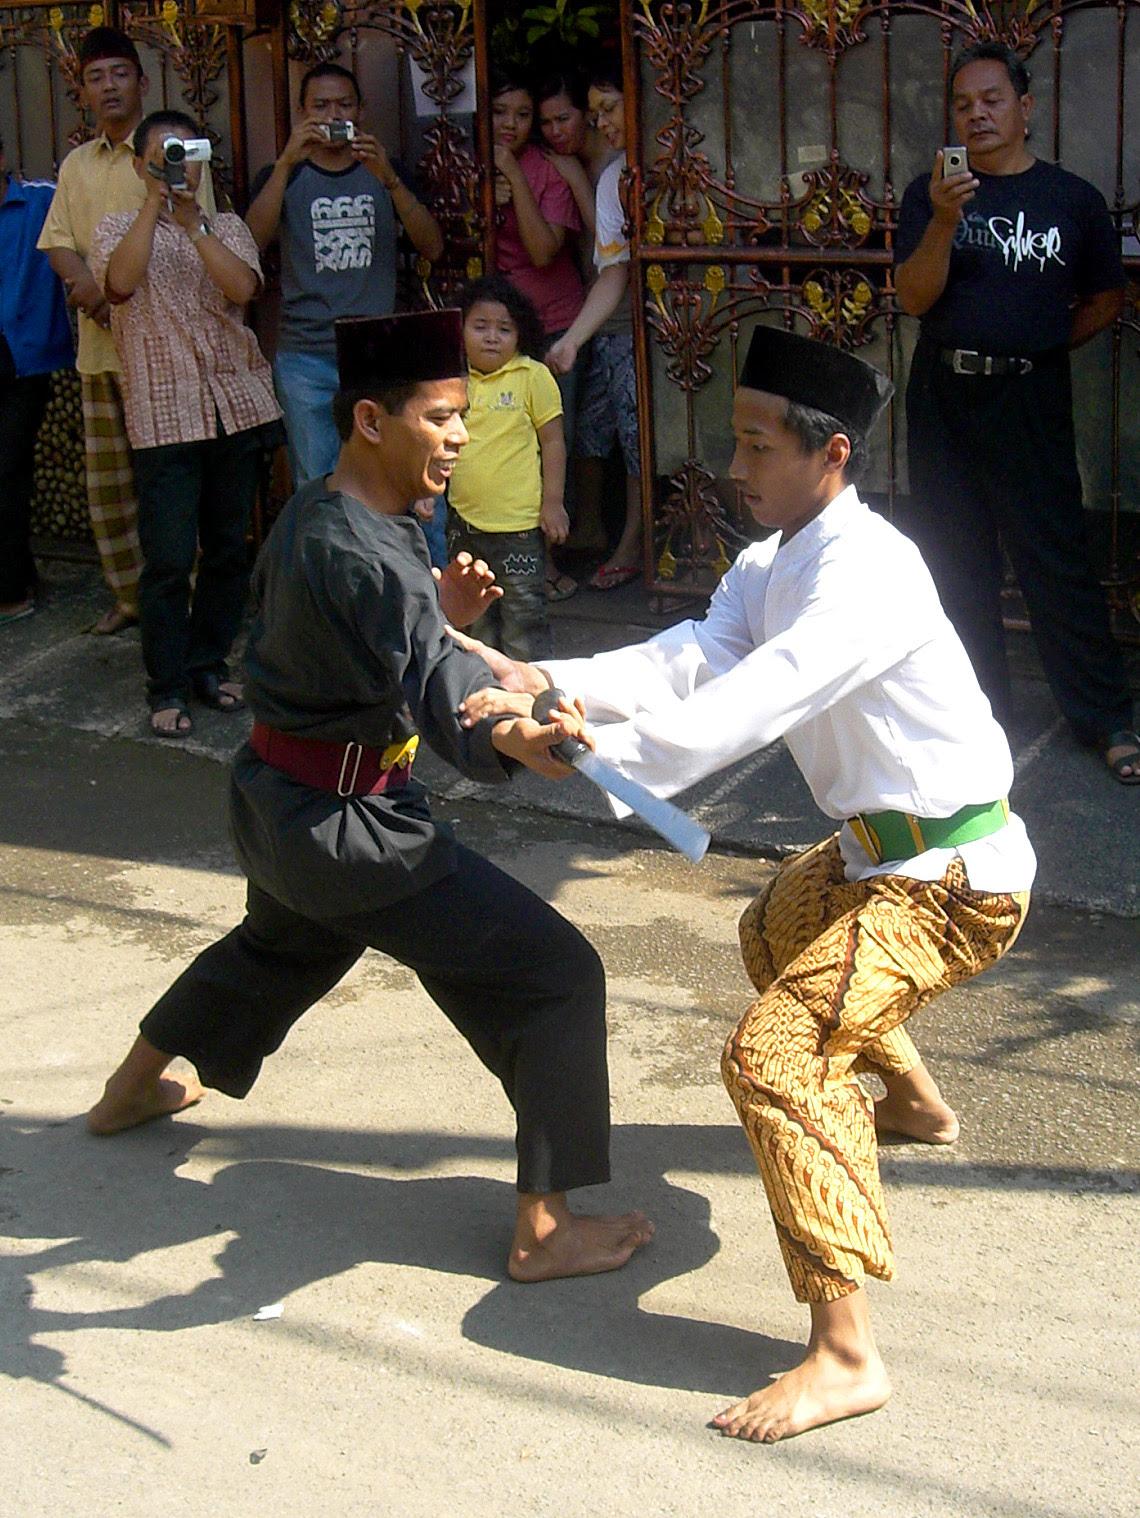 http://upload.wikimedia.org/wikipedia/commons/5/57/Pencak_Silat_Betawi_2.jpg